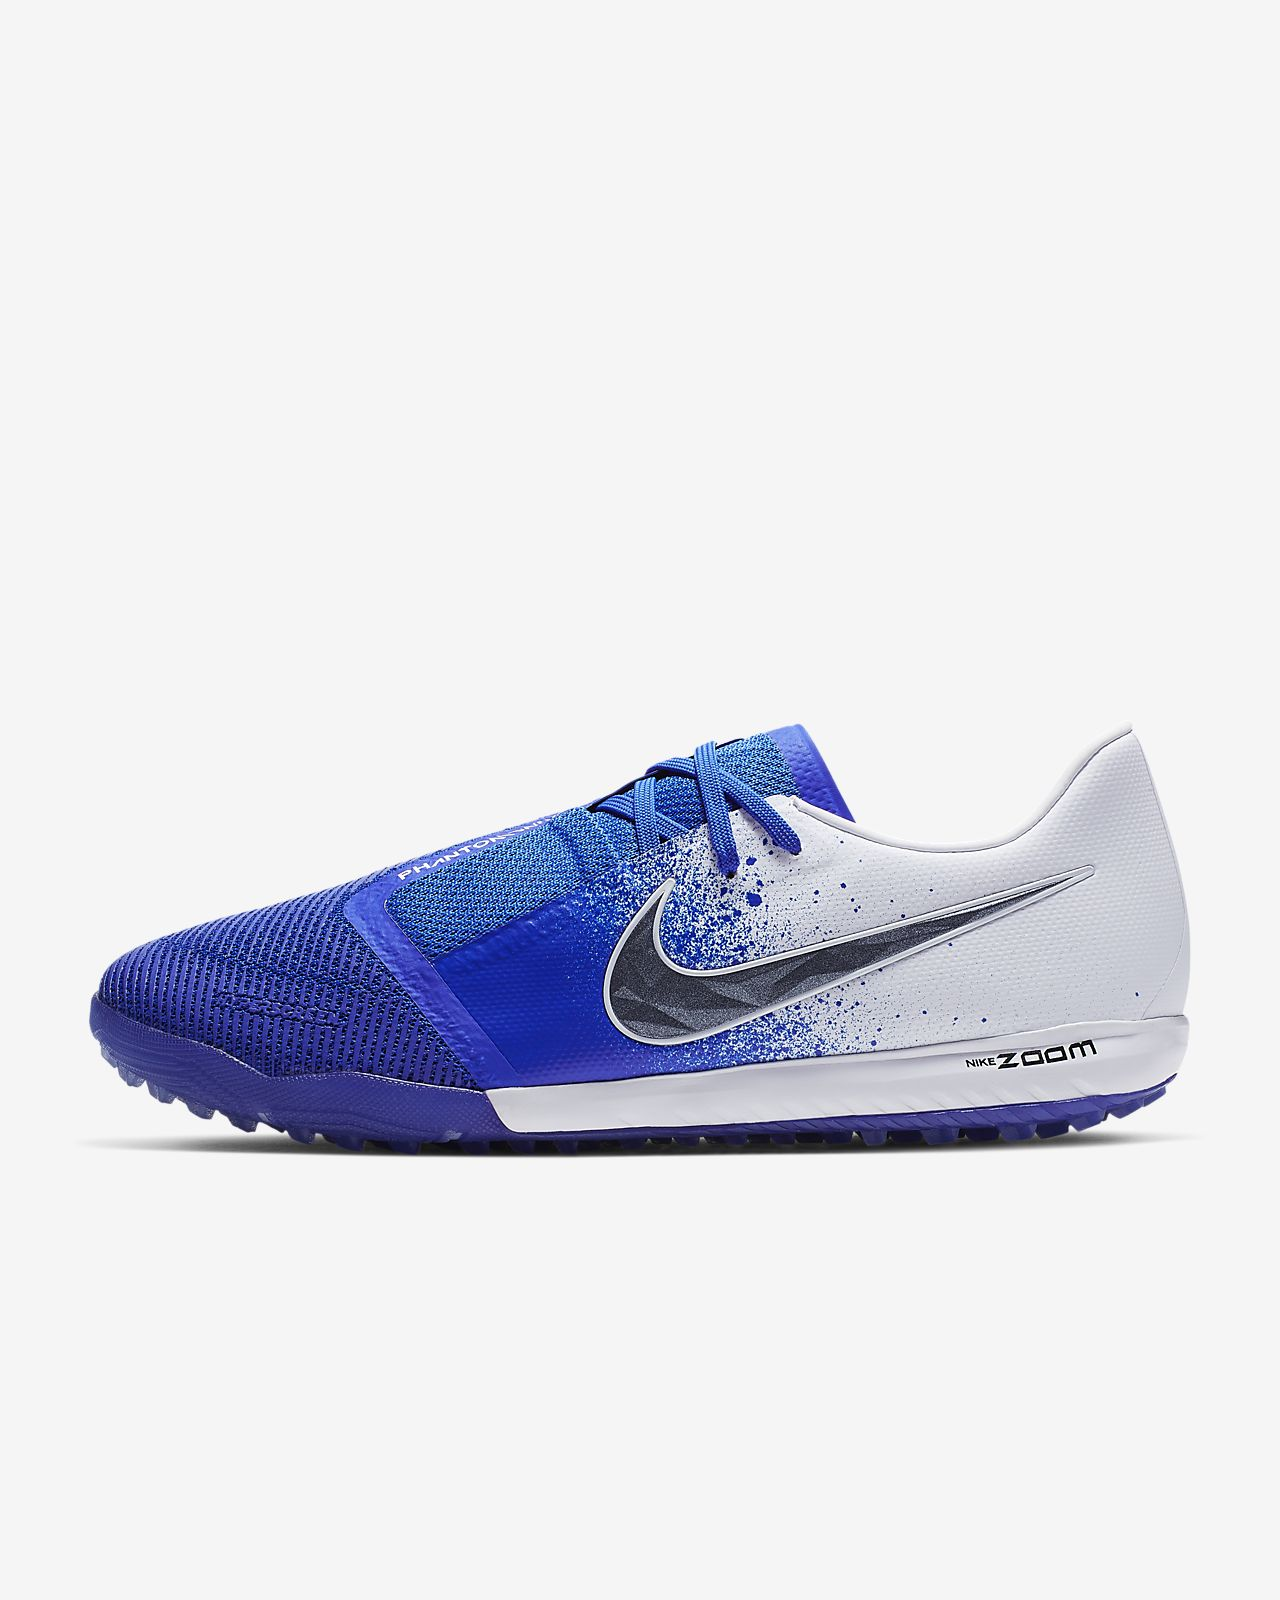 low priced 0d0bb 45bd7 ... Fotbollssko för grus turf Nike Zoom Phantom Venom Pro TF